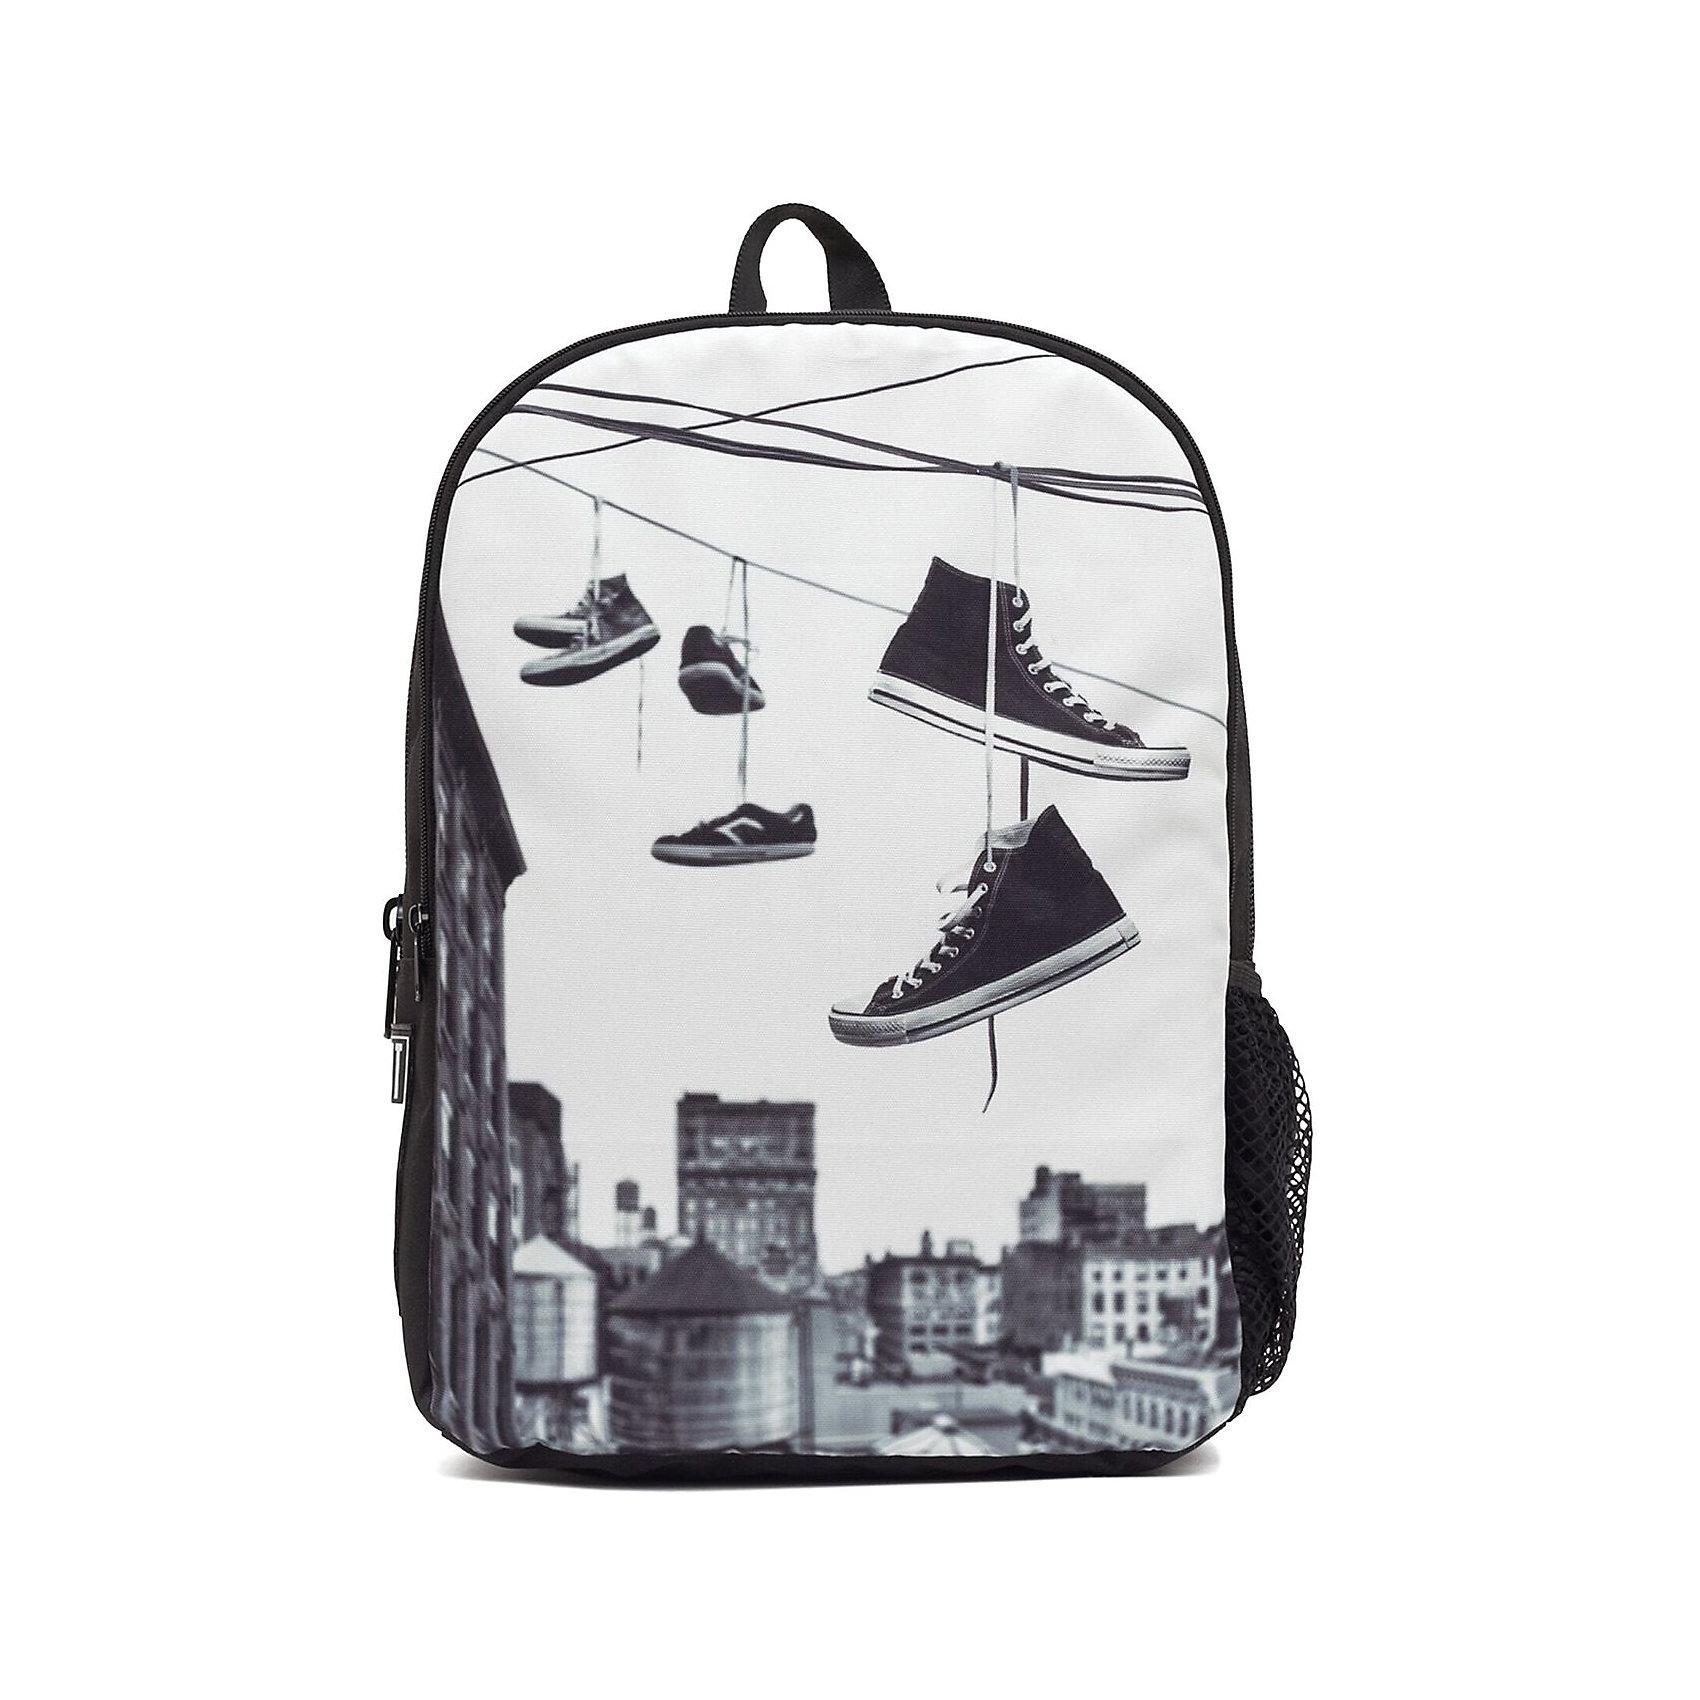 Рюкзак Straight Outta Brooklyn: Hanging Shoes, цвет мультиРюкзаки<br>Вес: 0,5 кг<br>Размер: 43х30х16 см<br>Состав: рюкзак<br>Наличие светоотражающих элементов: нет<br>Материал: полиэстер<br><br>Ширина мм: 430<br>Глубина мм: 300<br>Высота мм: 160<br>Вес г: 500<br>Возраст от месяцев: 120<br>Возраст до месяцев: 720<br>Пол: Унисекс<br>Возраст: Детский<br>SKU: 7054135